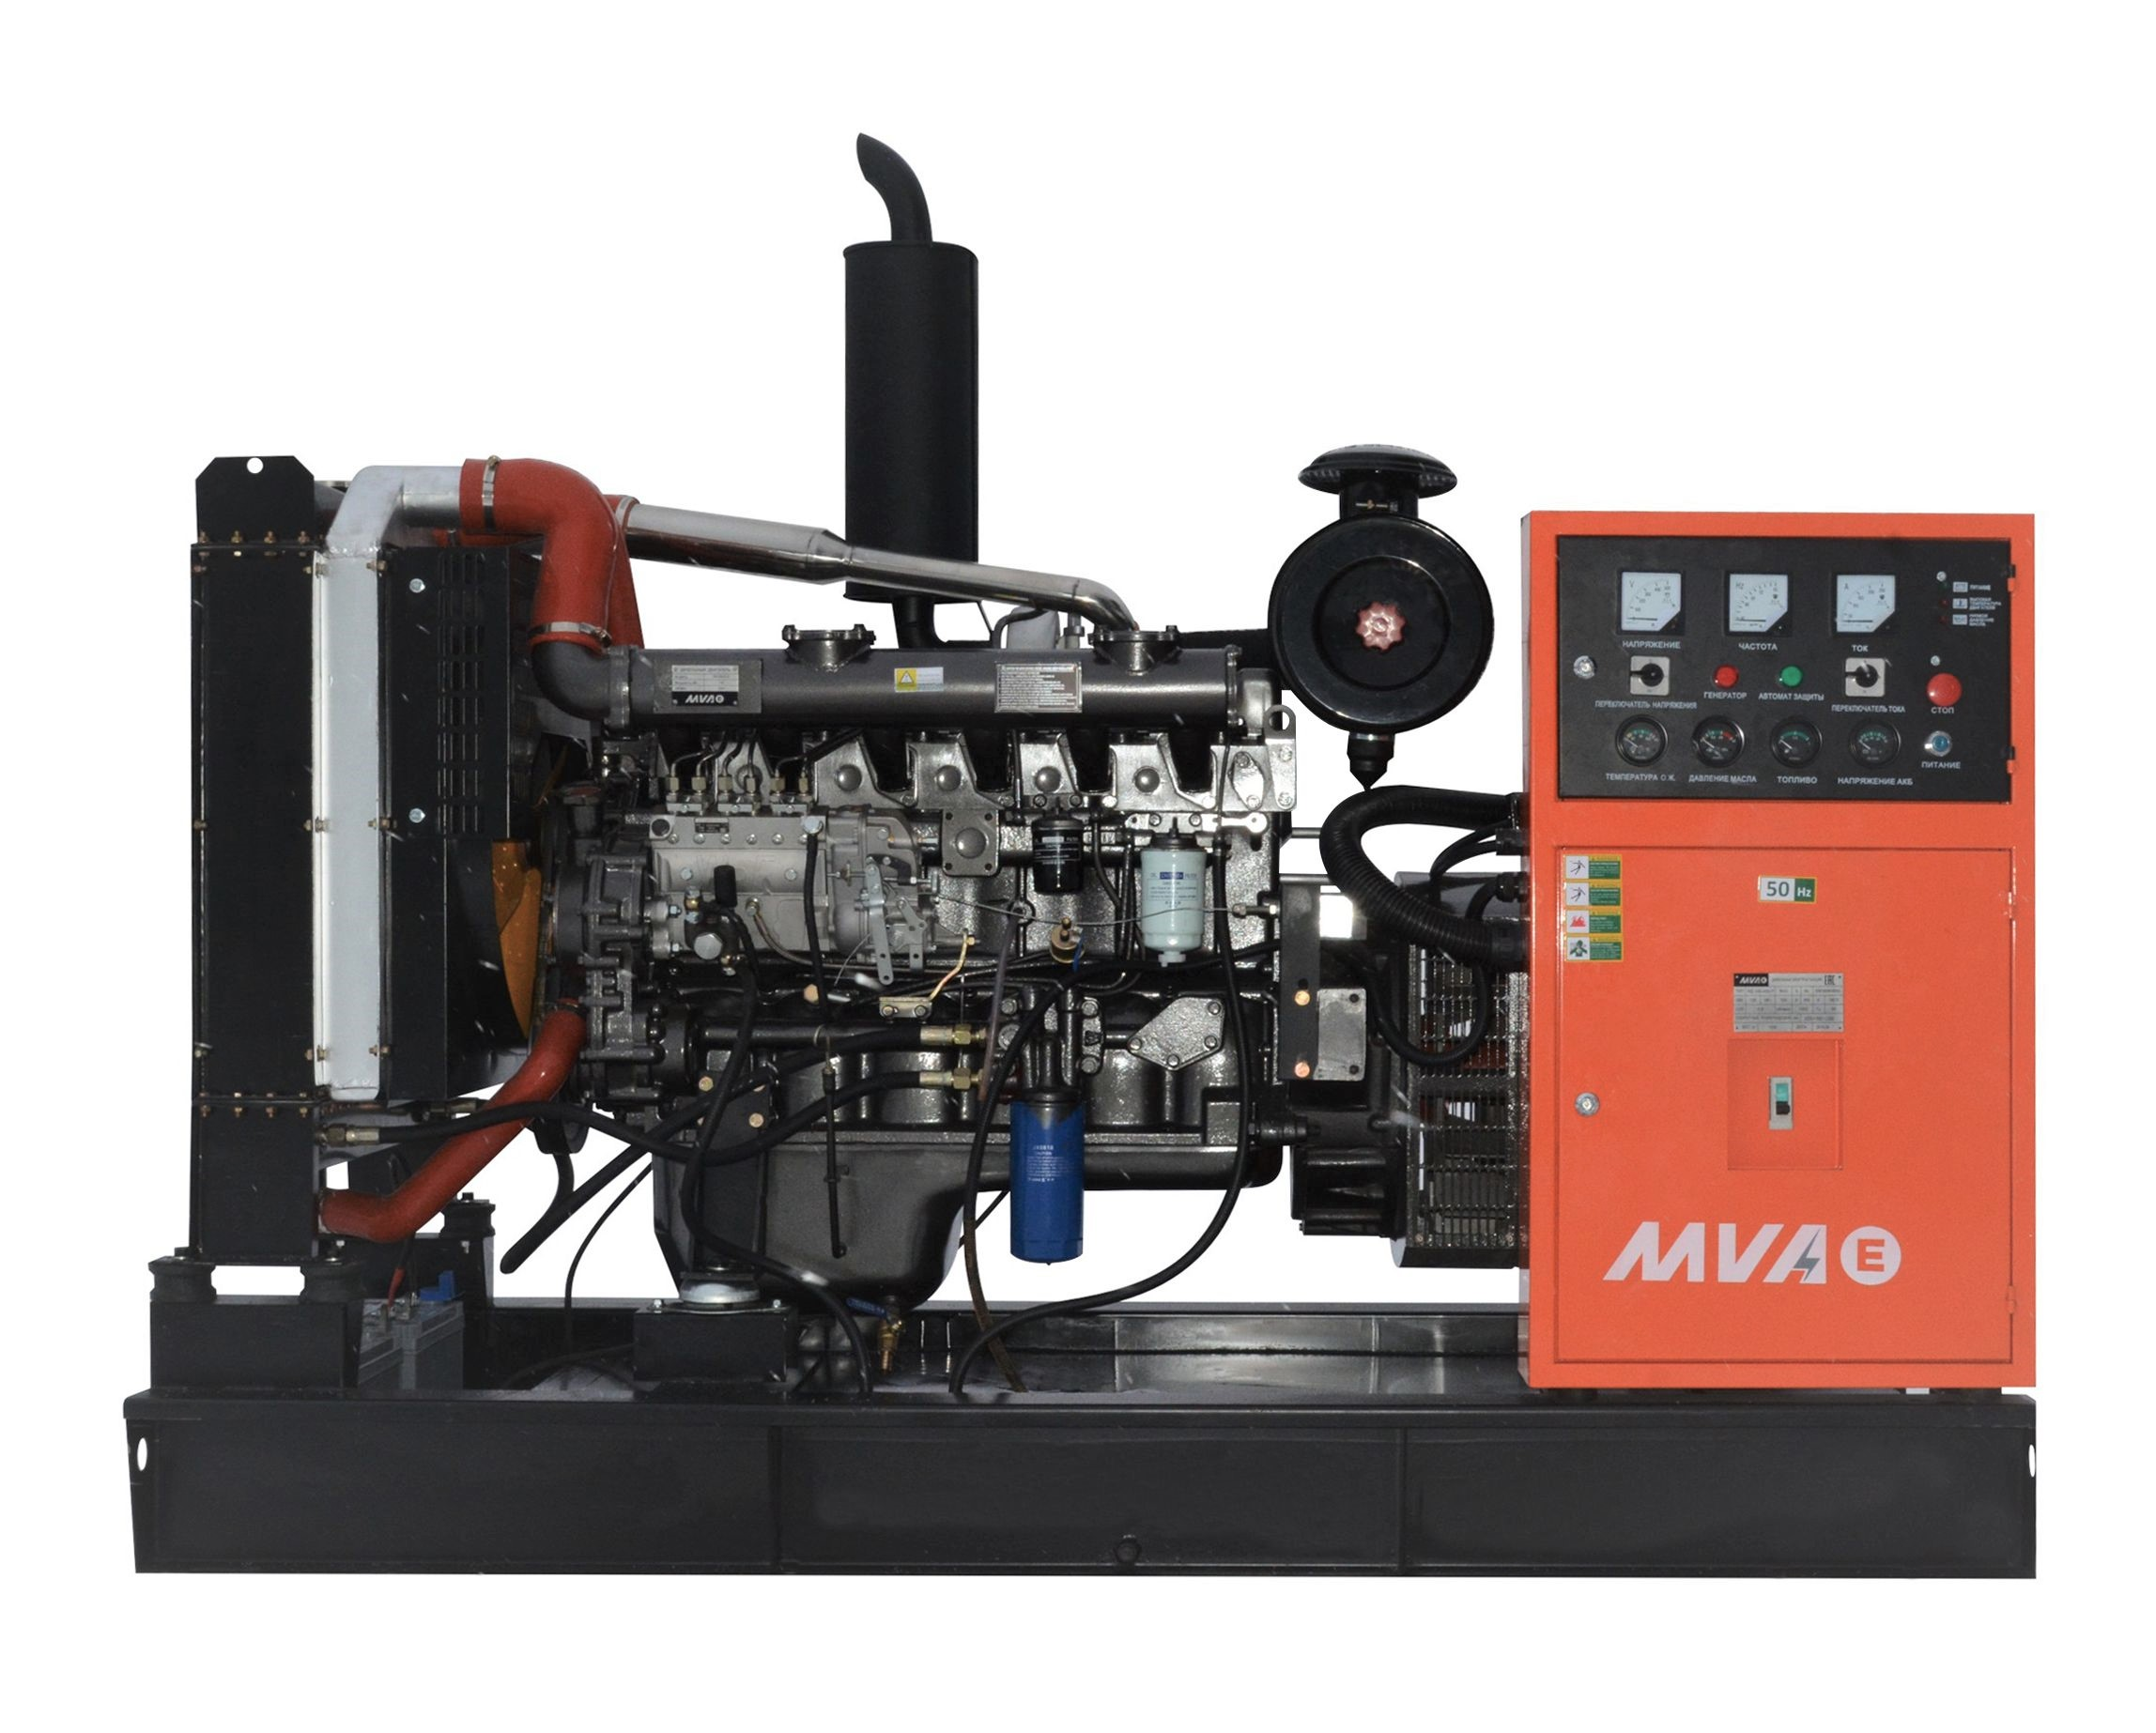 Внешний вид MVAE АД-240-400-Р на раме